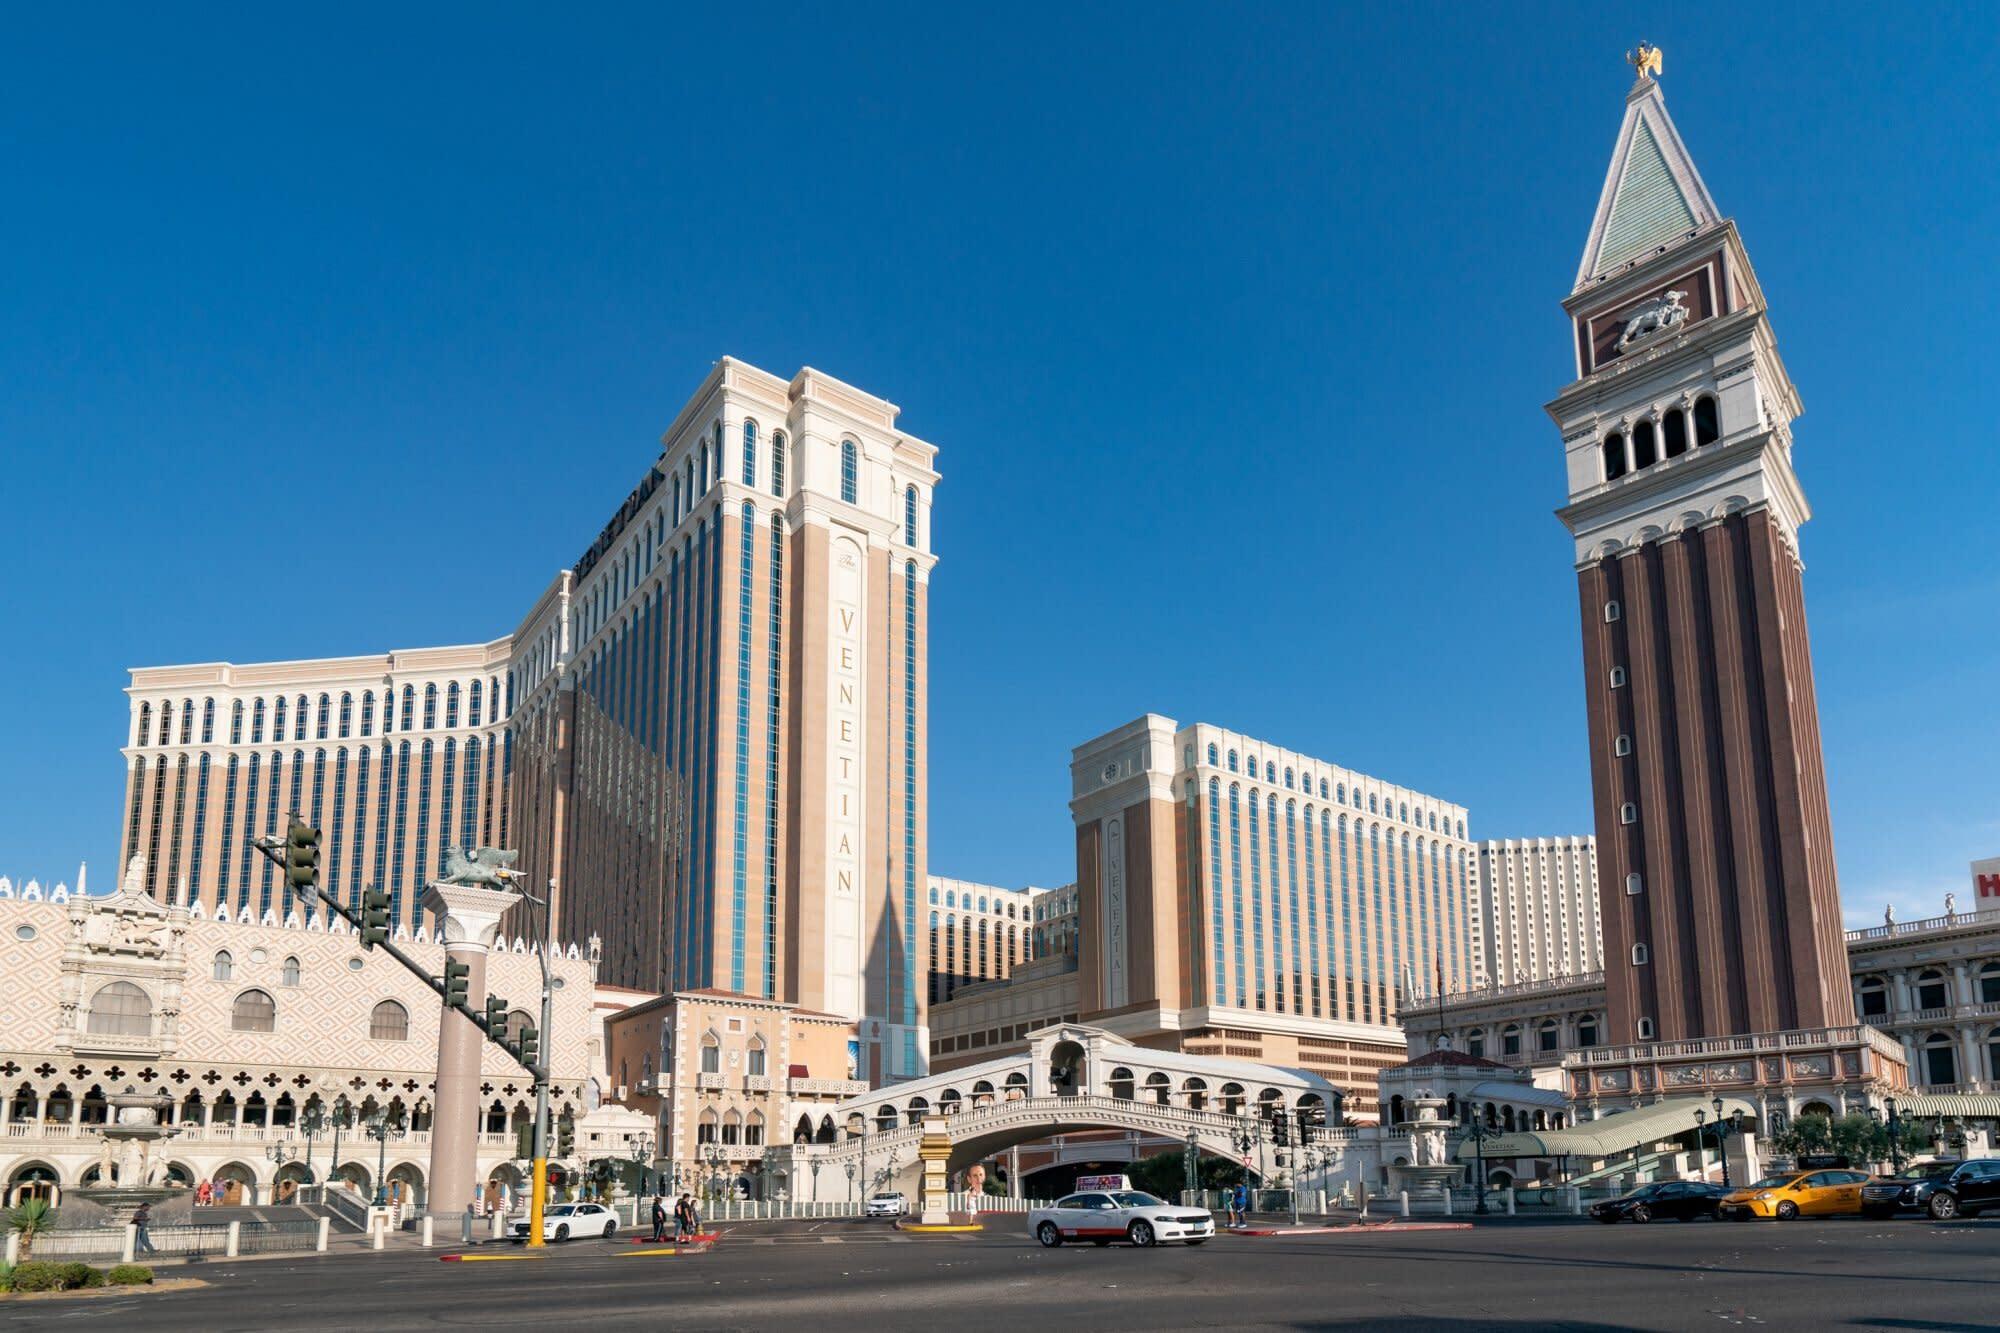 Las vegas casinos nfl lines slot casino online free